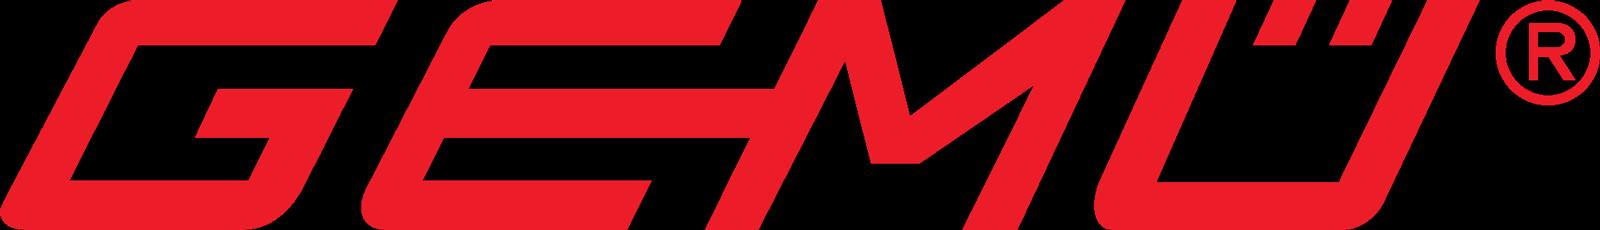 GEMÜ Holding GmbH & Co. KG